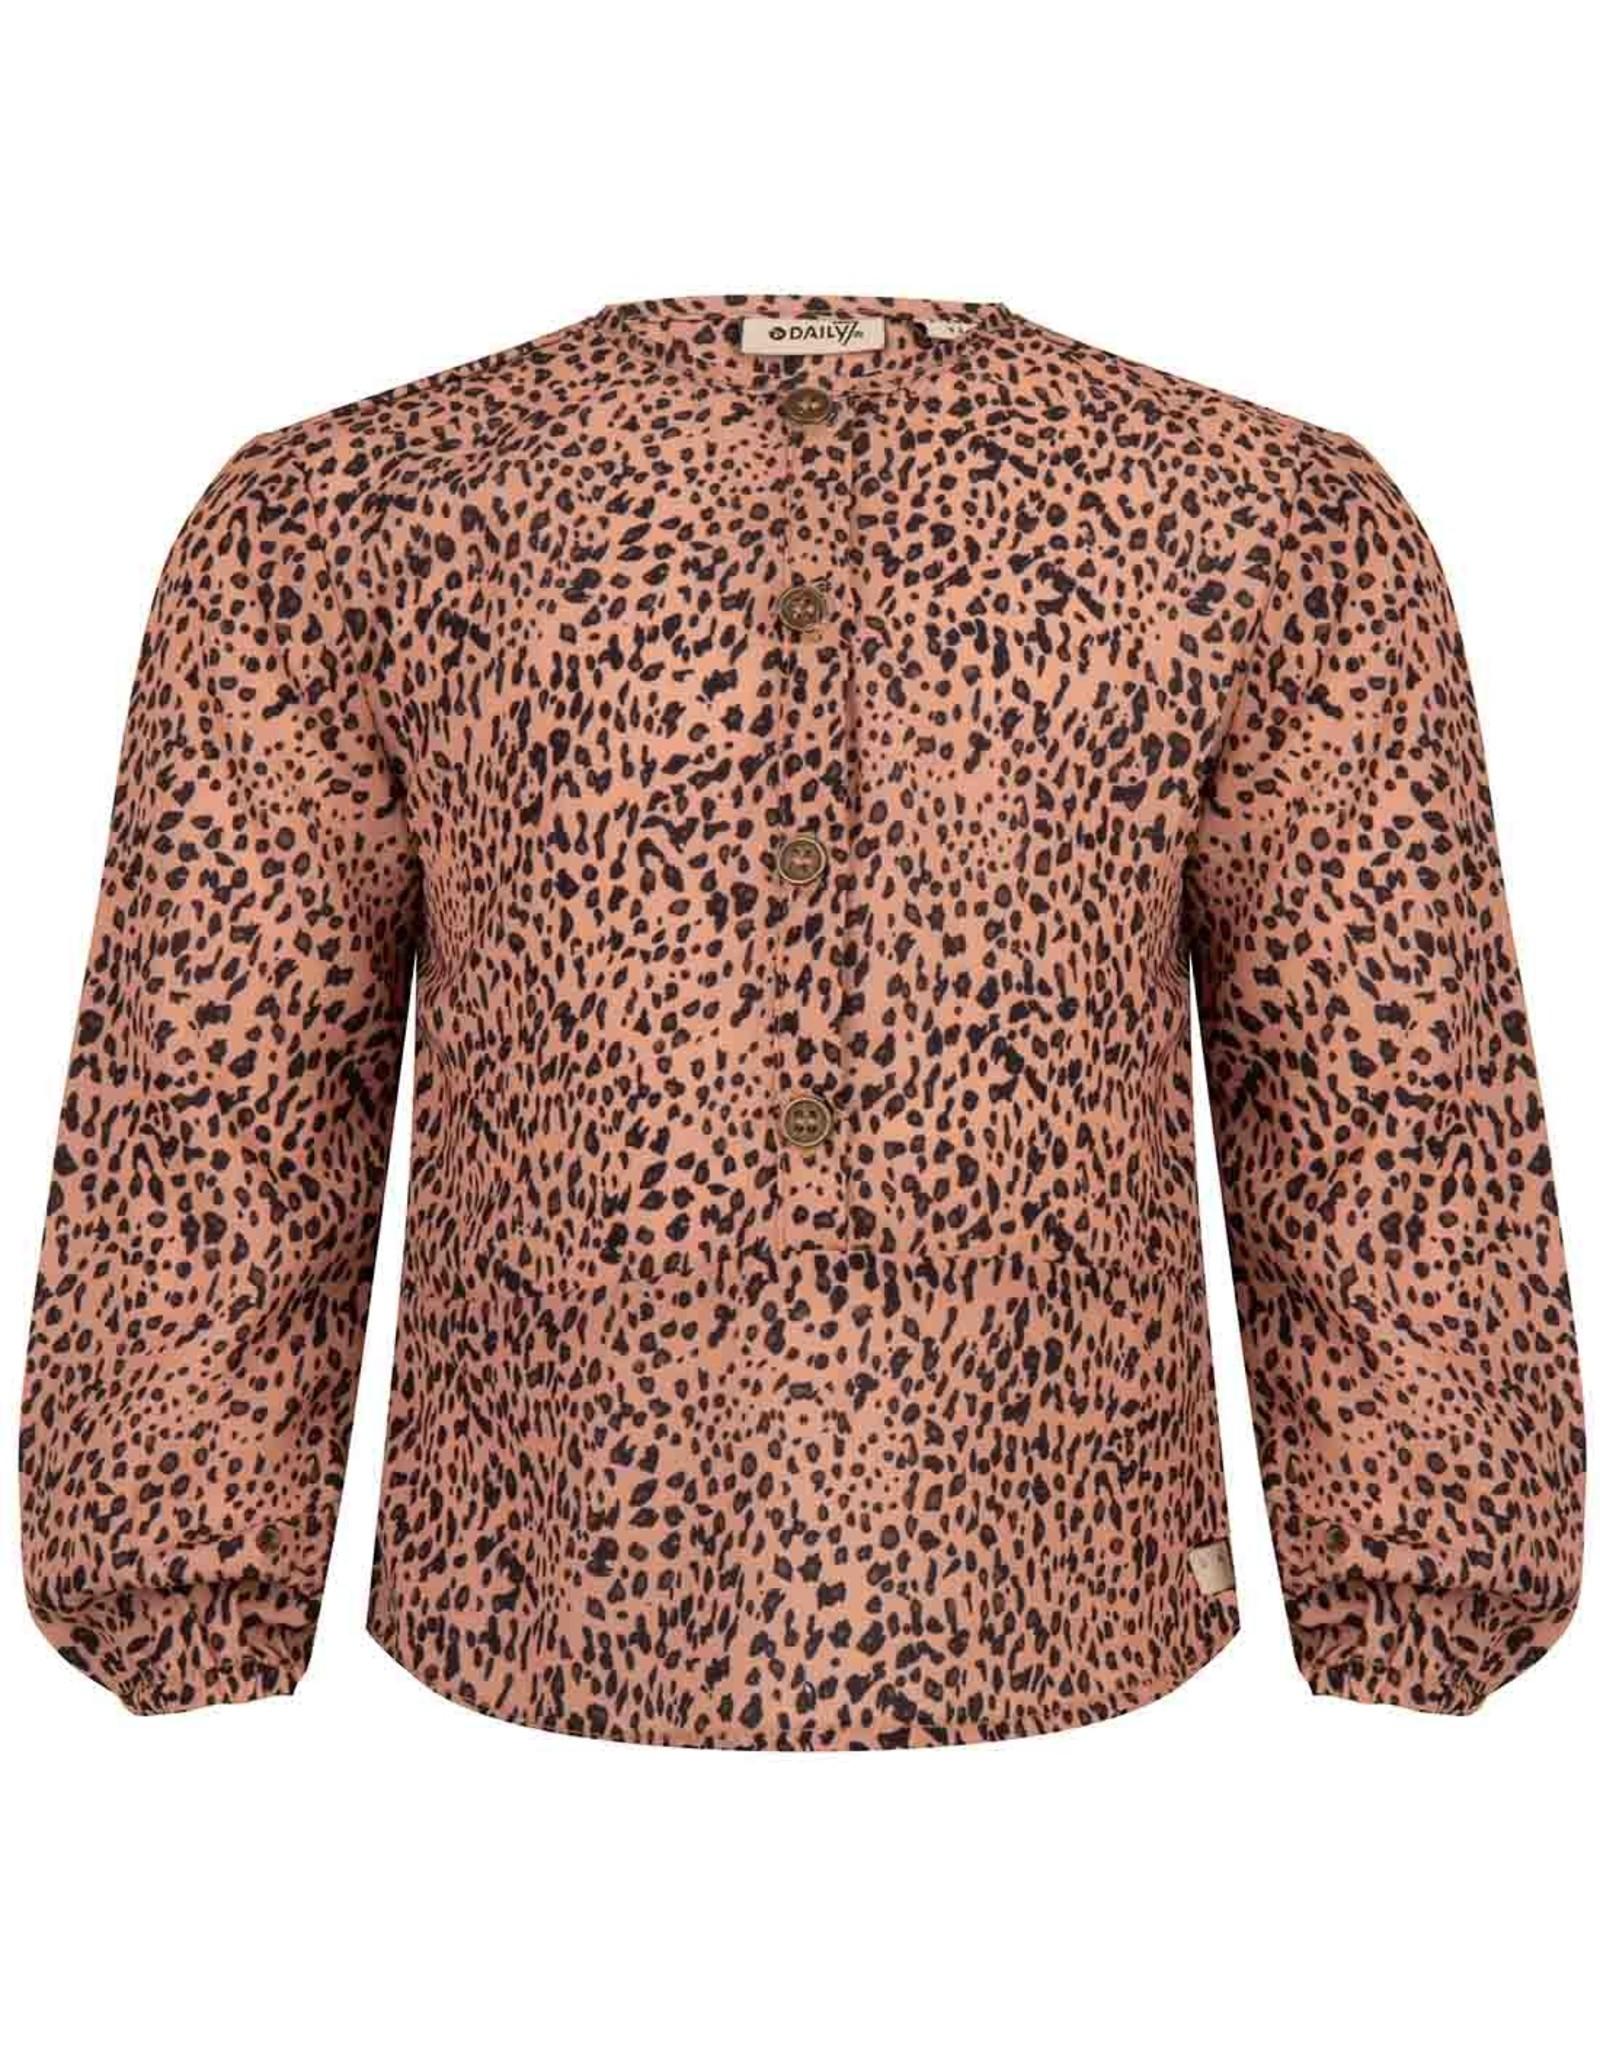 Daily7 Daily7 meisjes blouses Panter Brick Dust